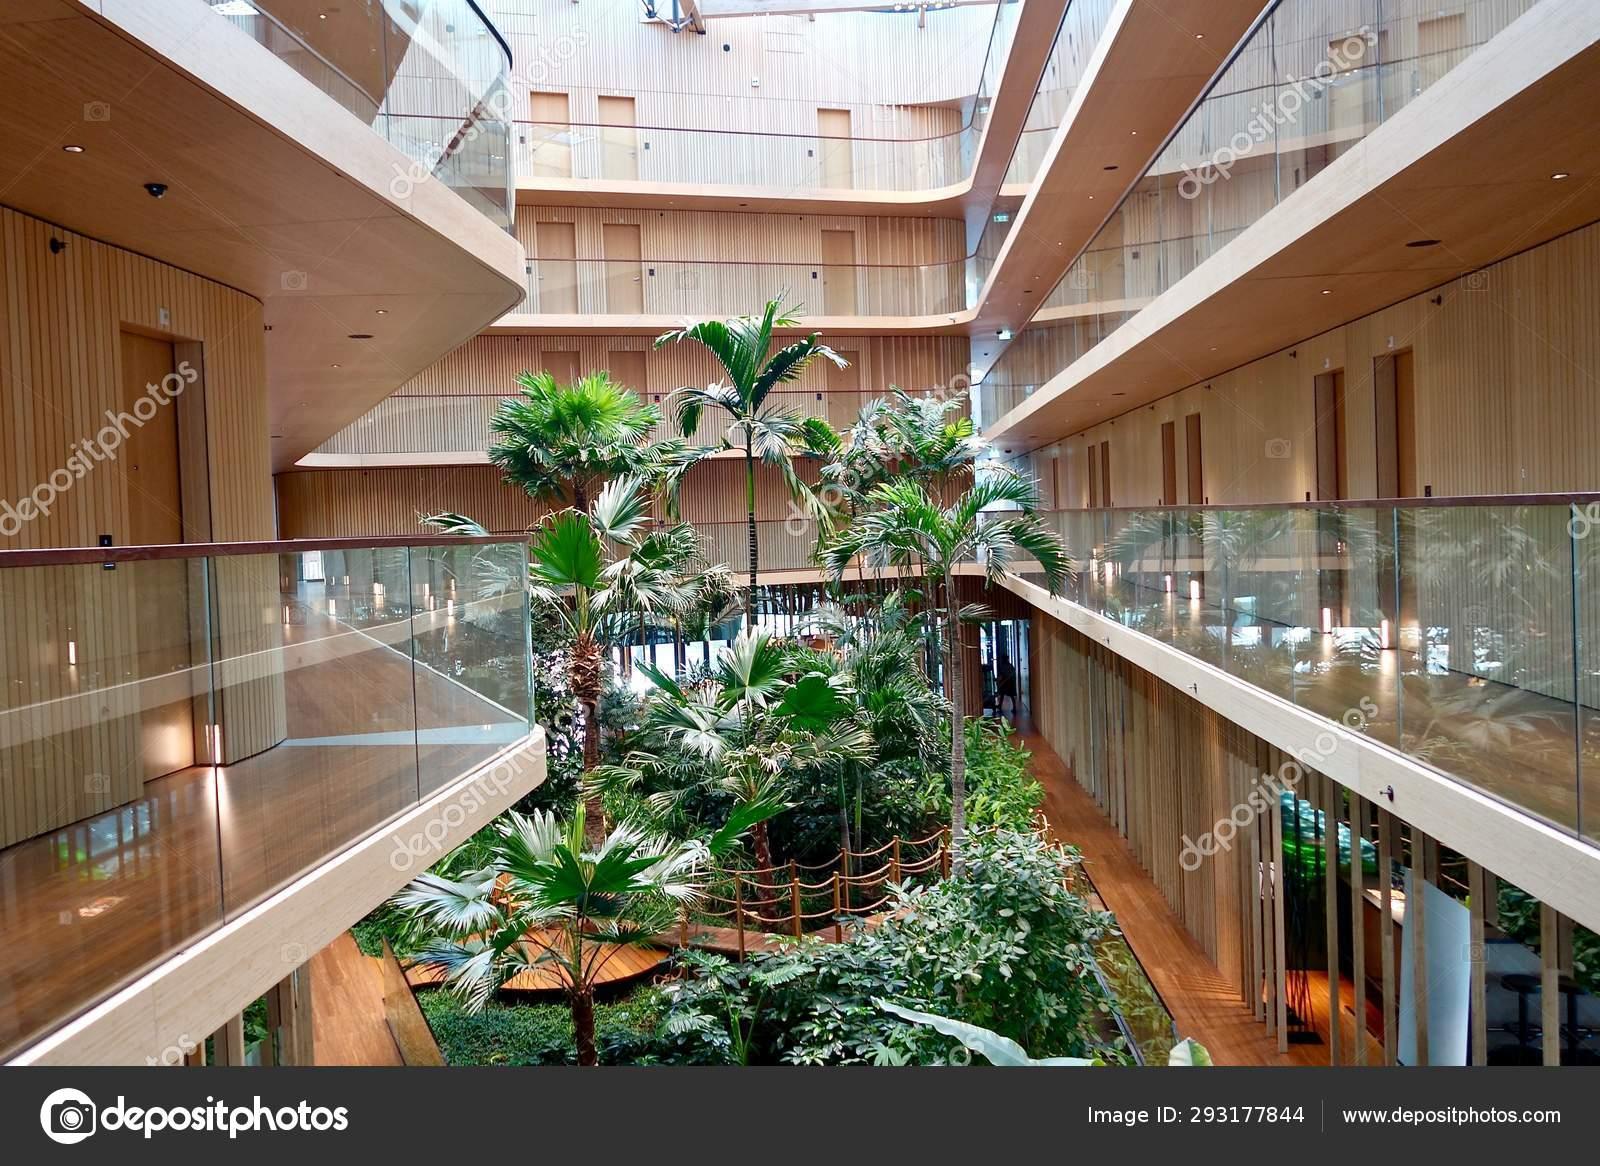 Tropischer Wald Hotel Jakarta Amsterdam Redaktionelles Stockfoto C Kirill Volkov 293177844